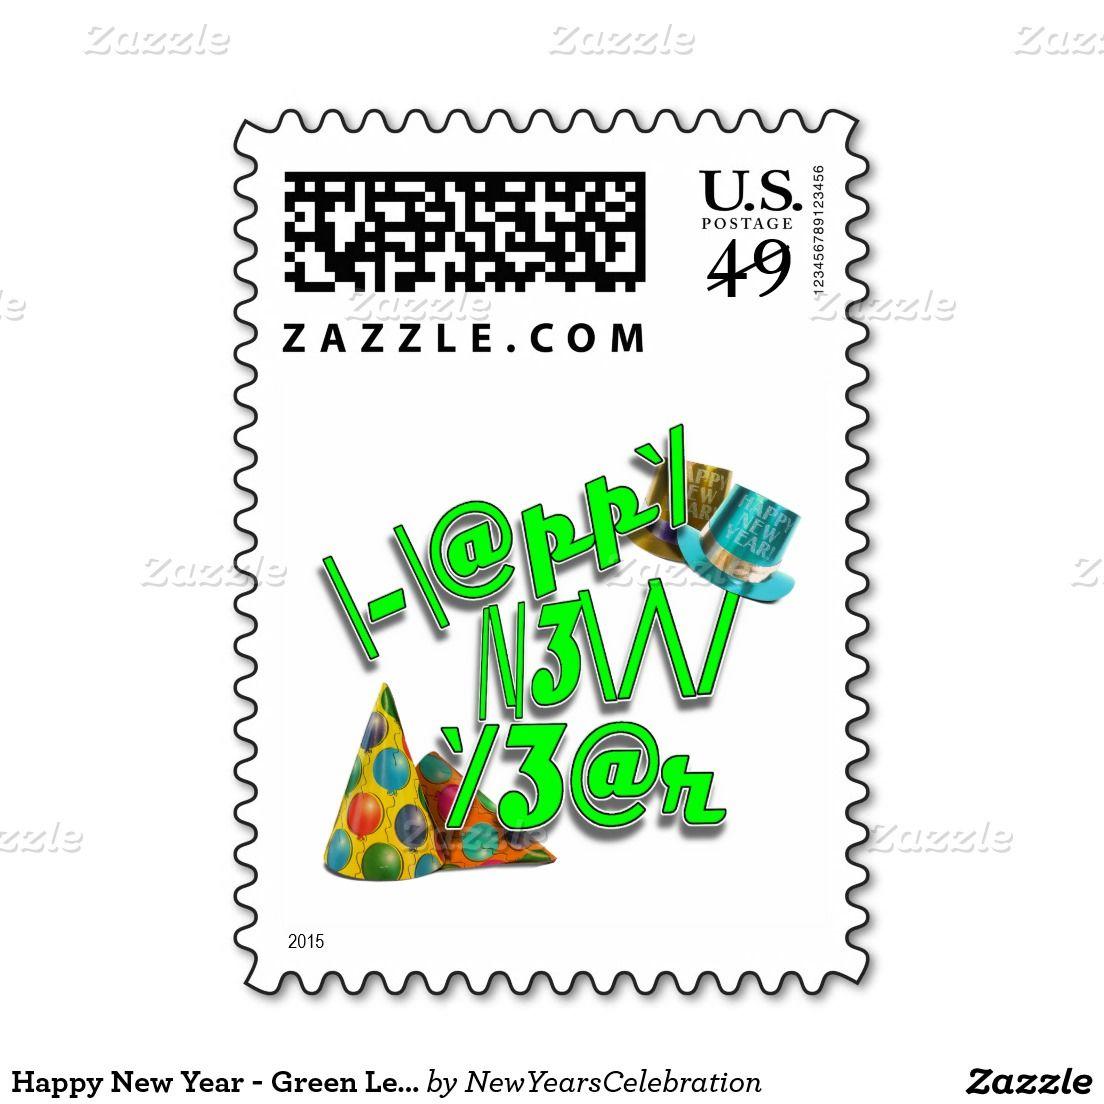 Green #Leet Style Custom Postage! #NewYearsPostage Stamps - #NewYearsCelebration #gravityx9 #Zazzle